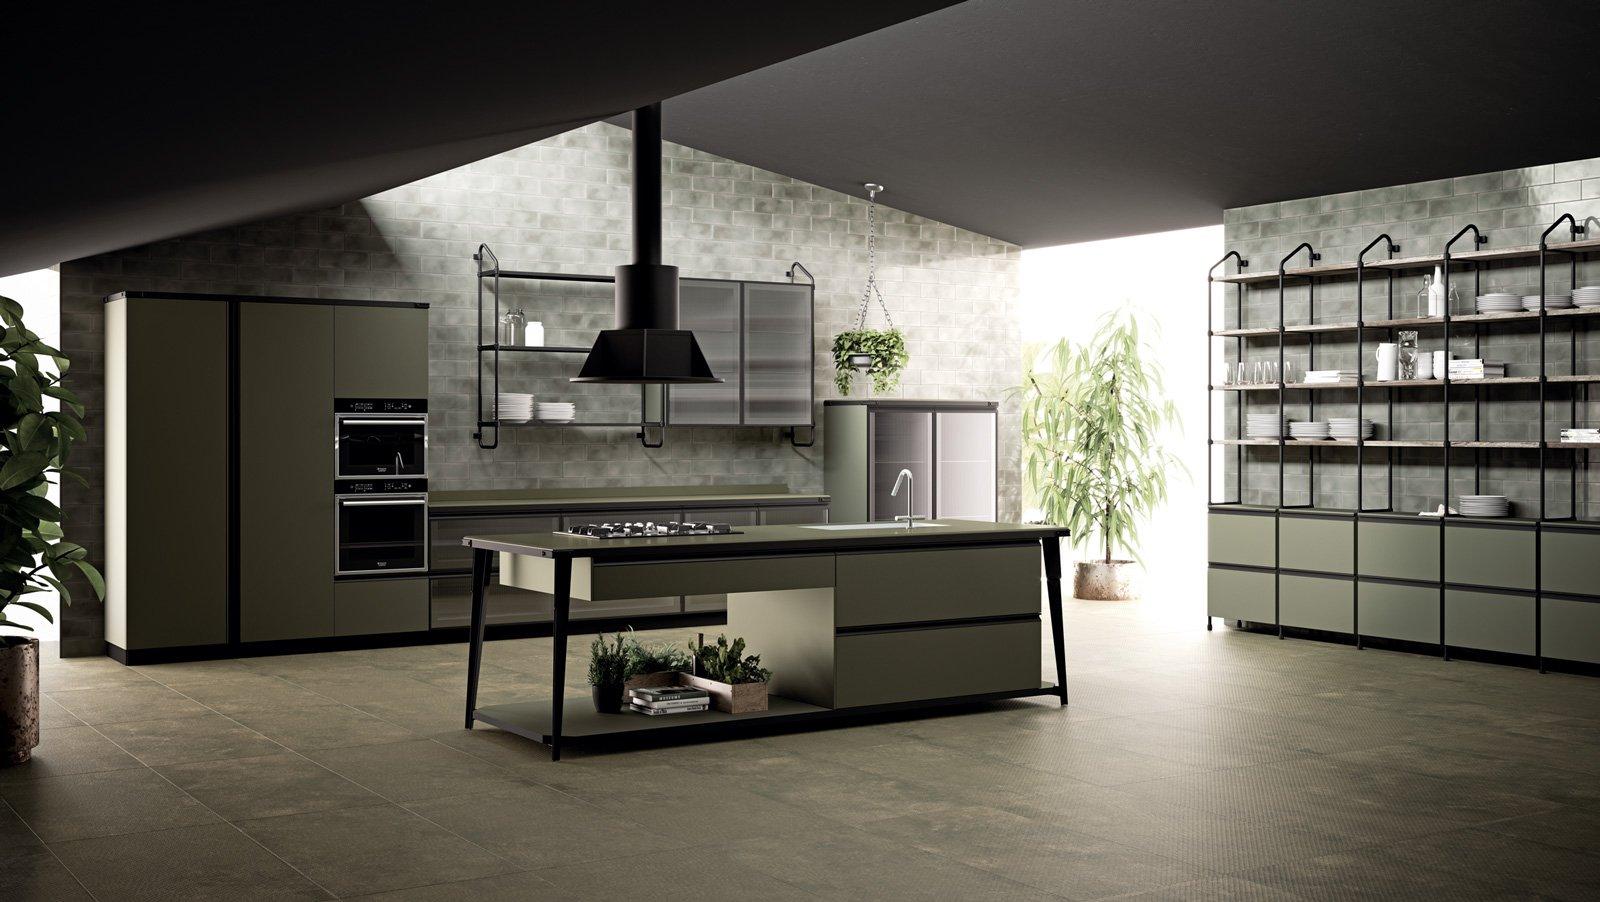 Cucine in stile industriale materiche e vissute cose di - Cucine italiane design ...